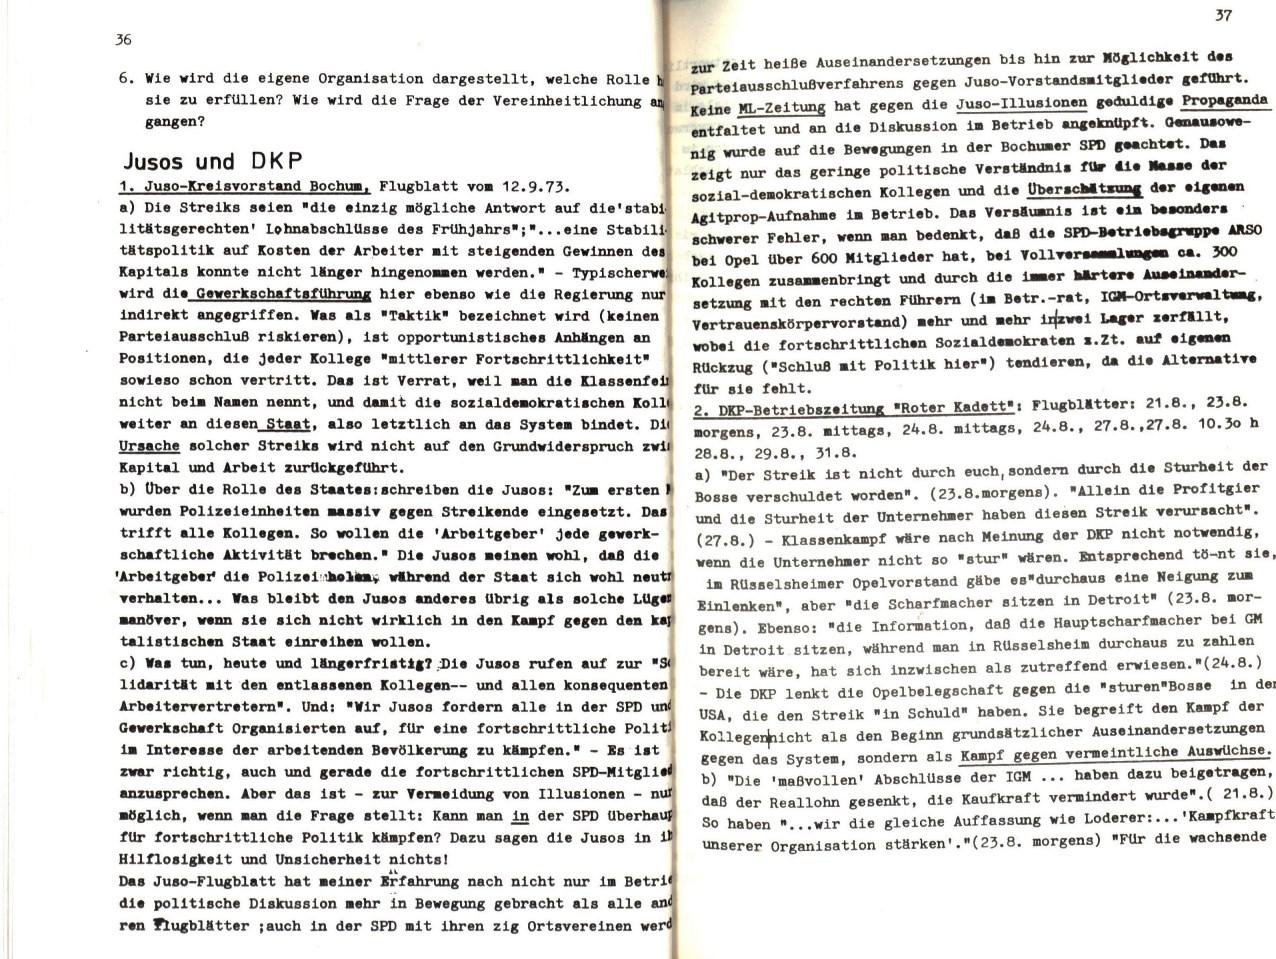 Bochum_IGM_Opel_PG_Opel_streikt_1973_020